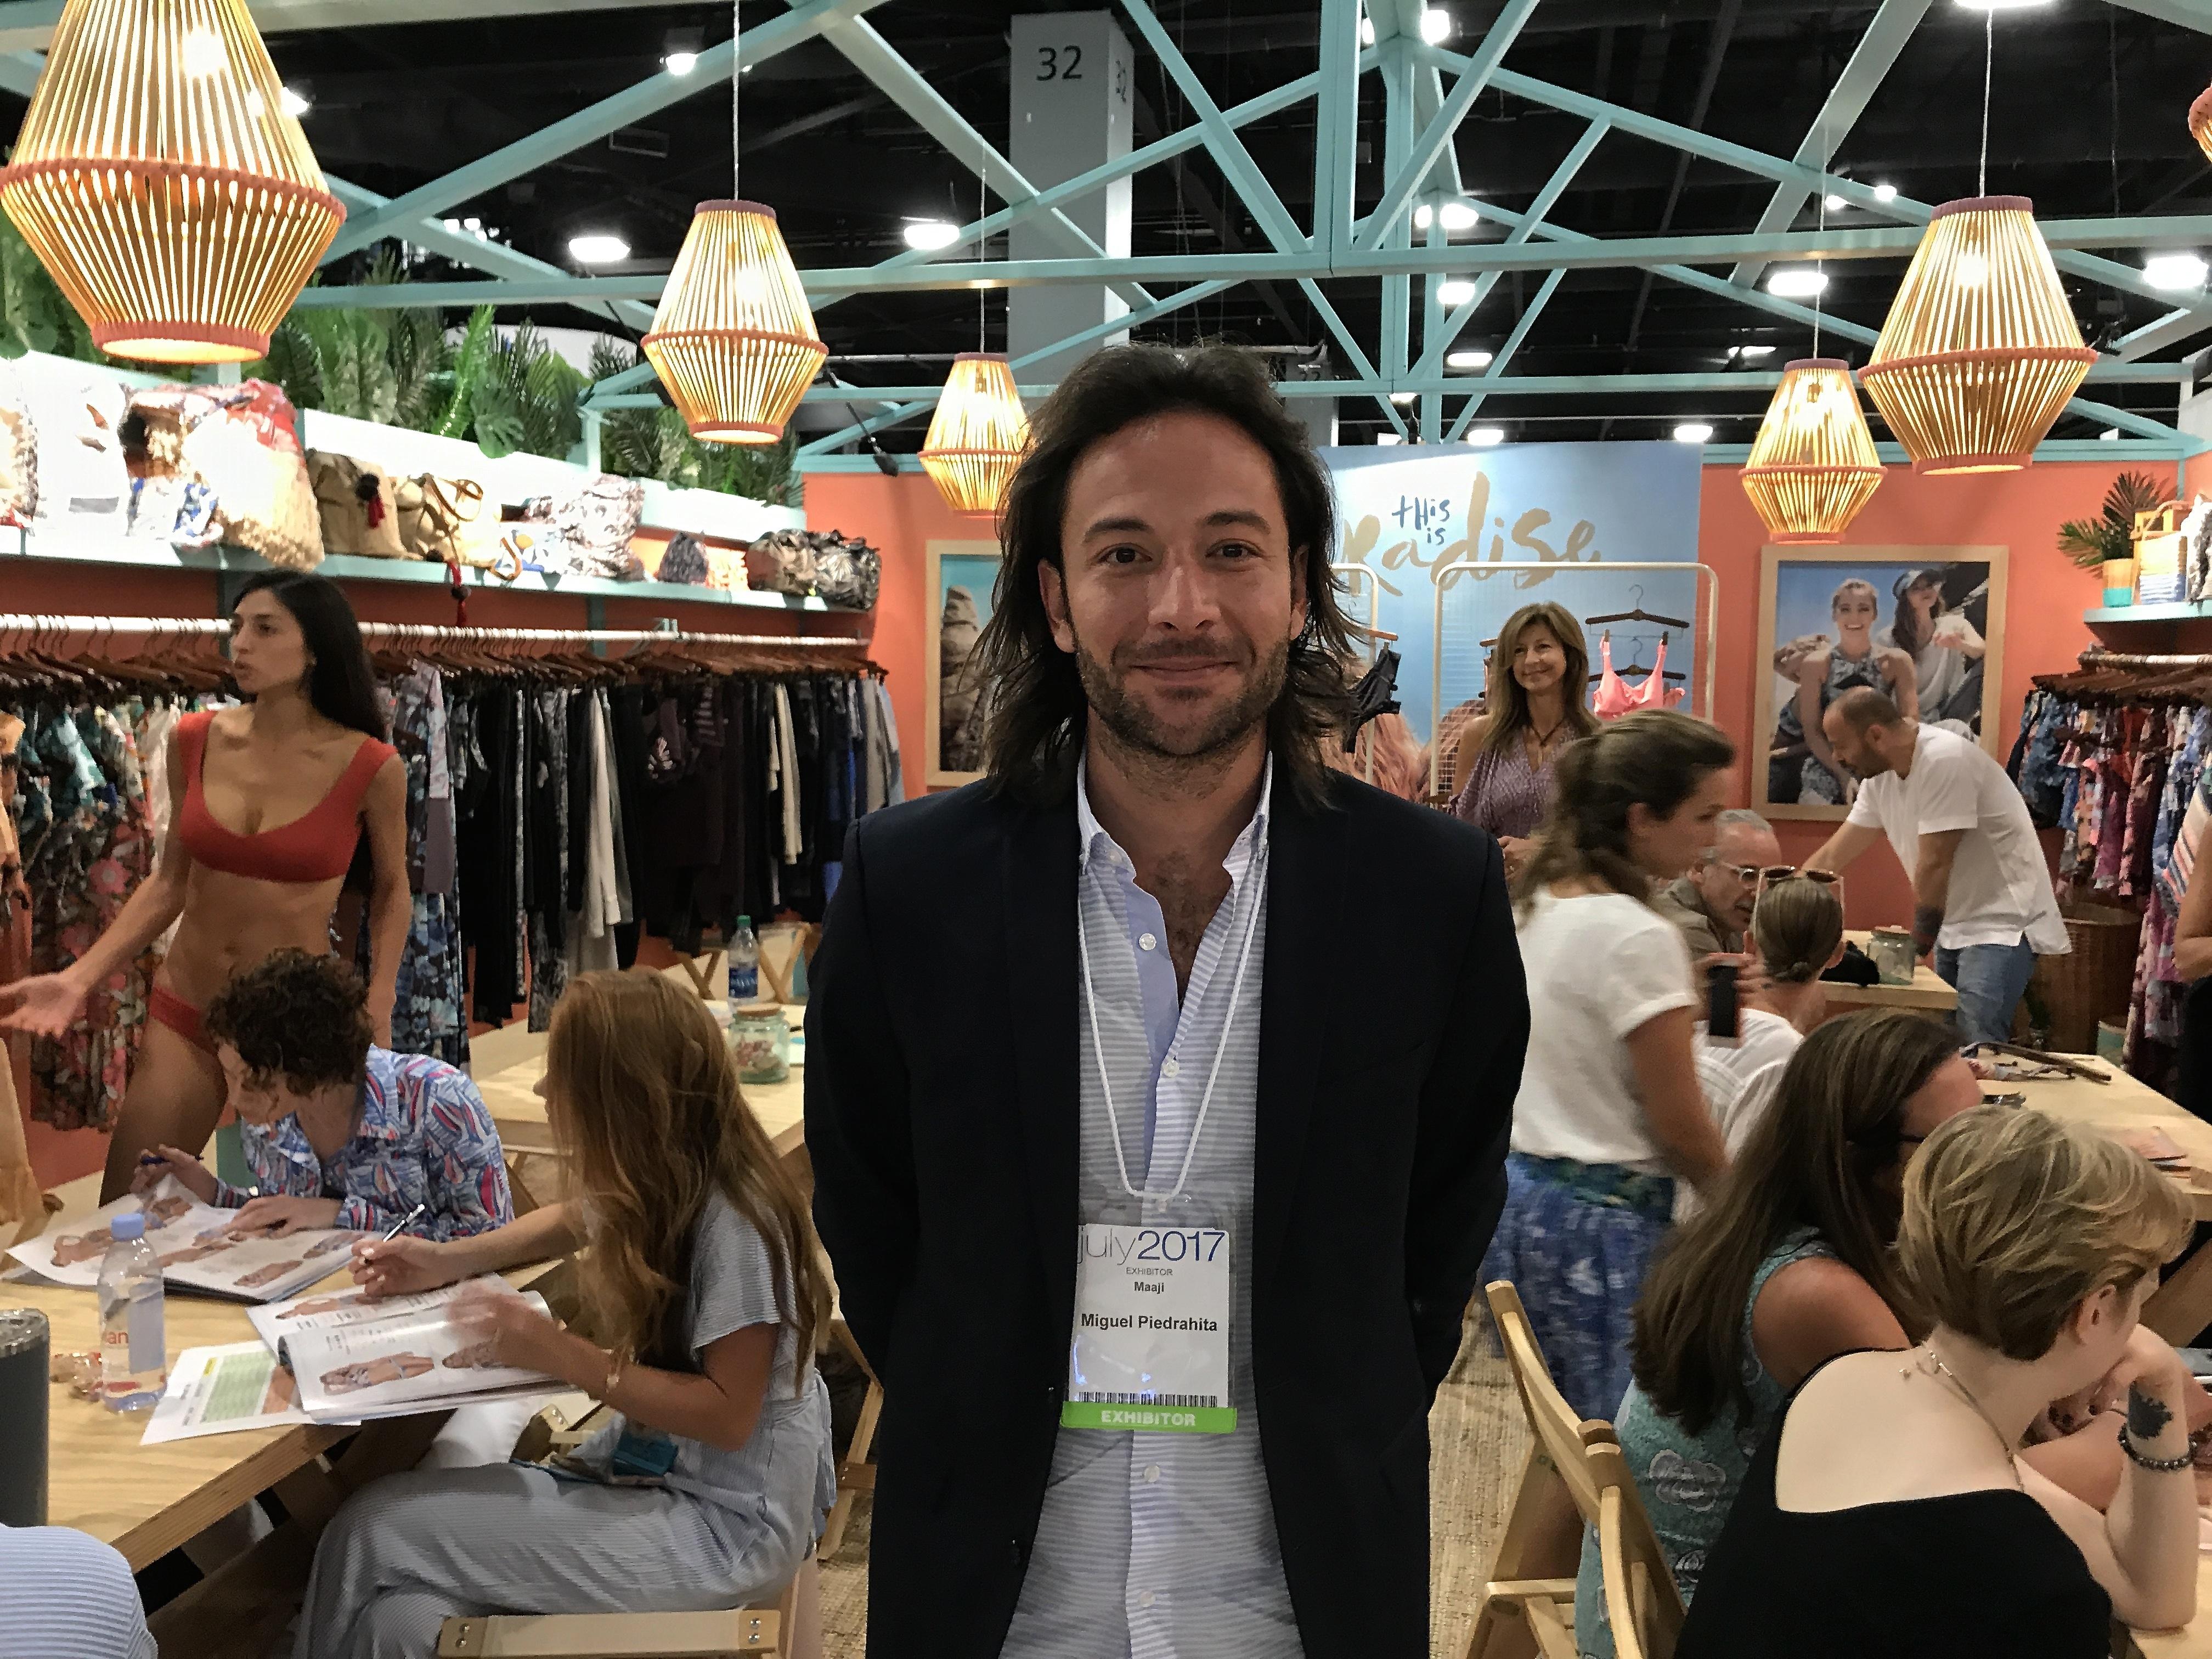 Maaji CEO Miguel Piedrahita at Miami SwimShow last week - Photo by SES